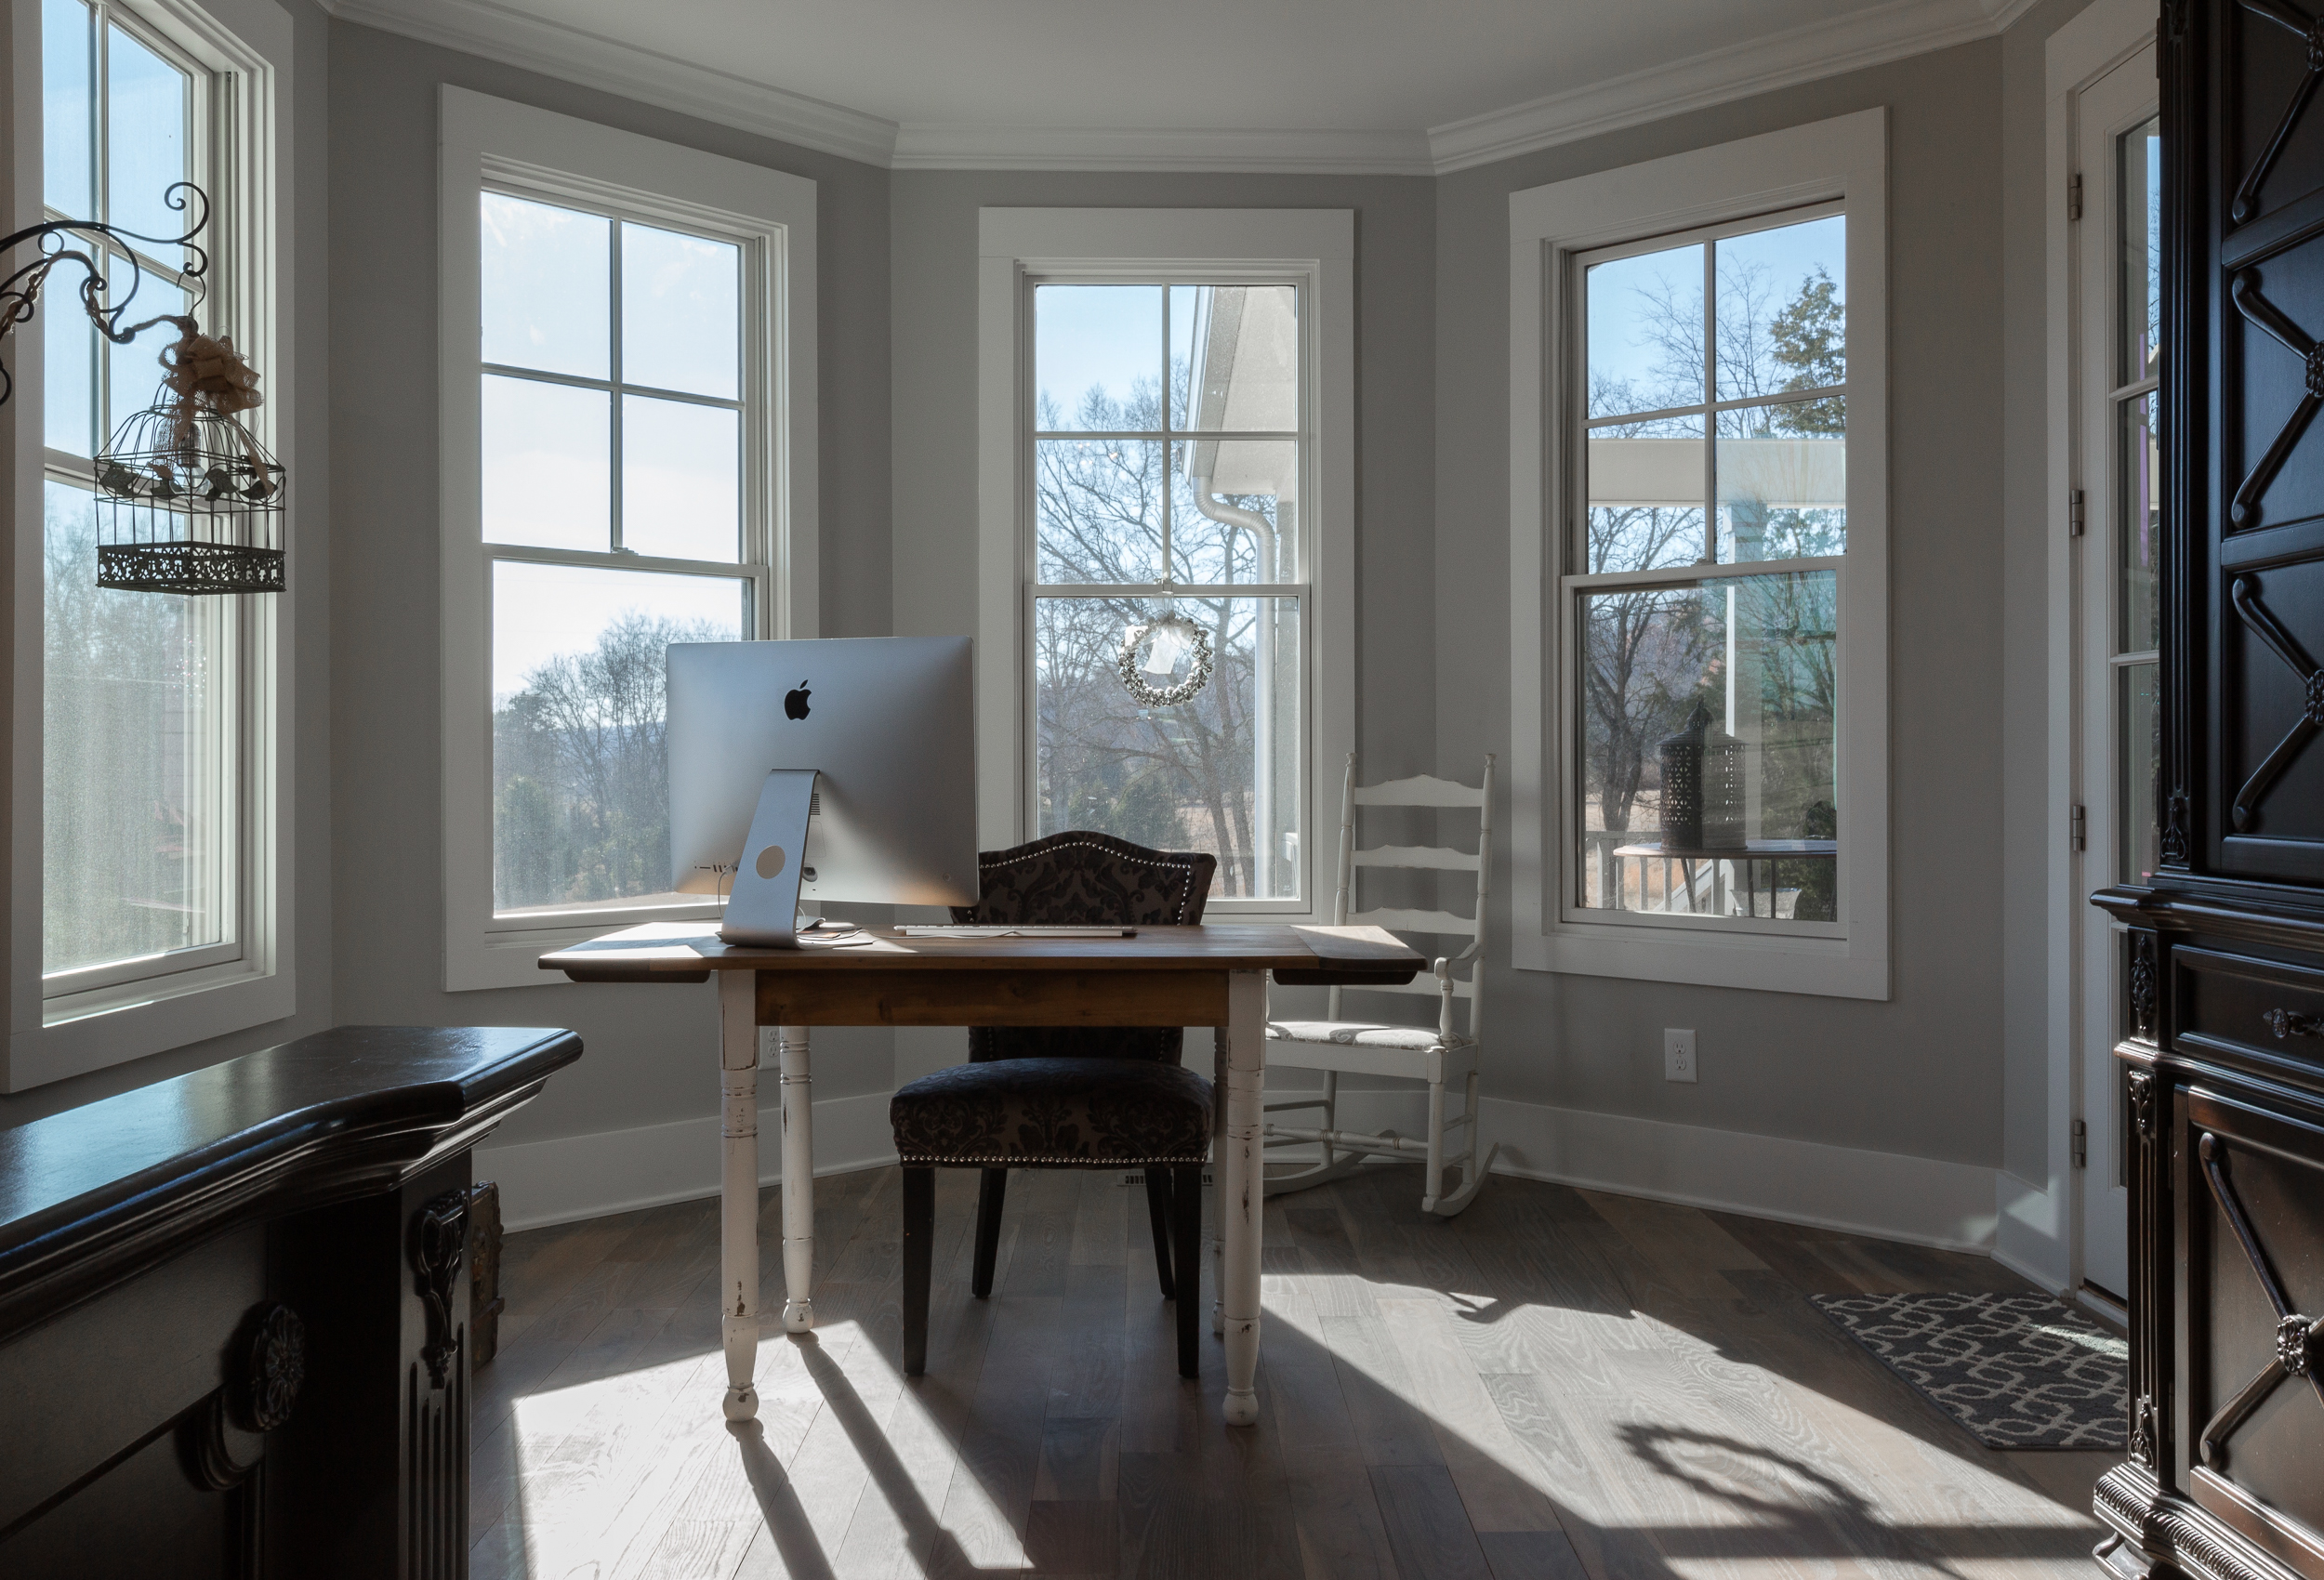 domophotos high standard real estate photography - Nashville, TN home office